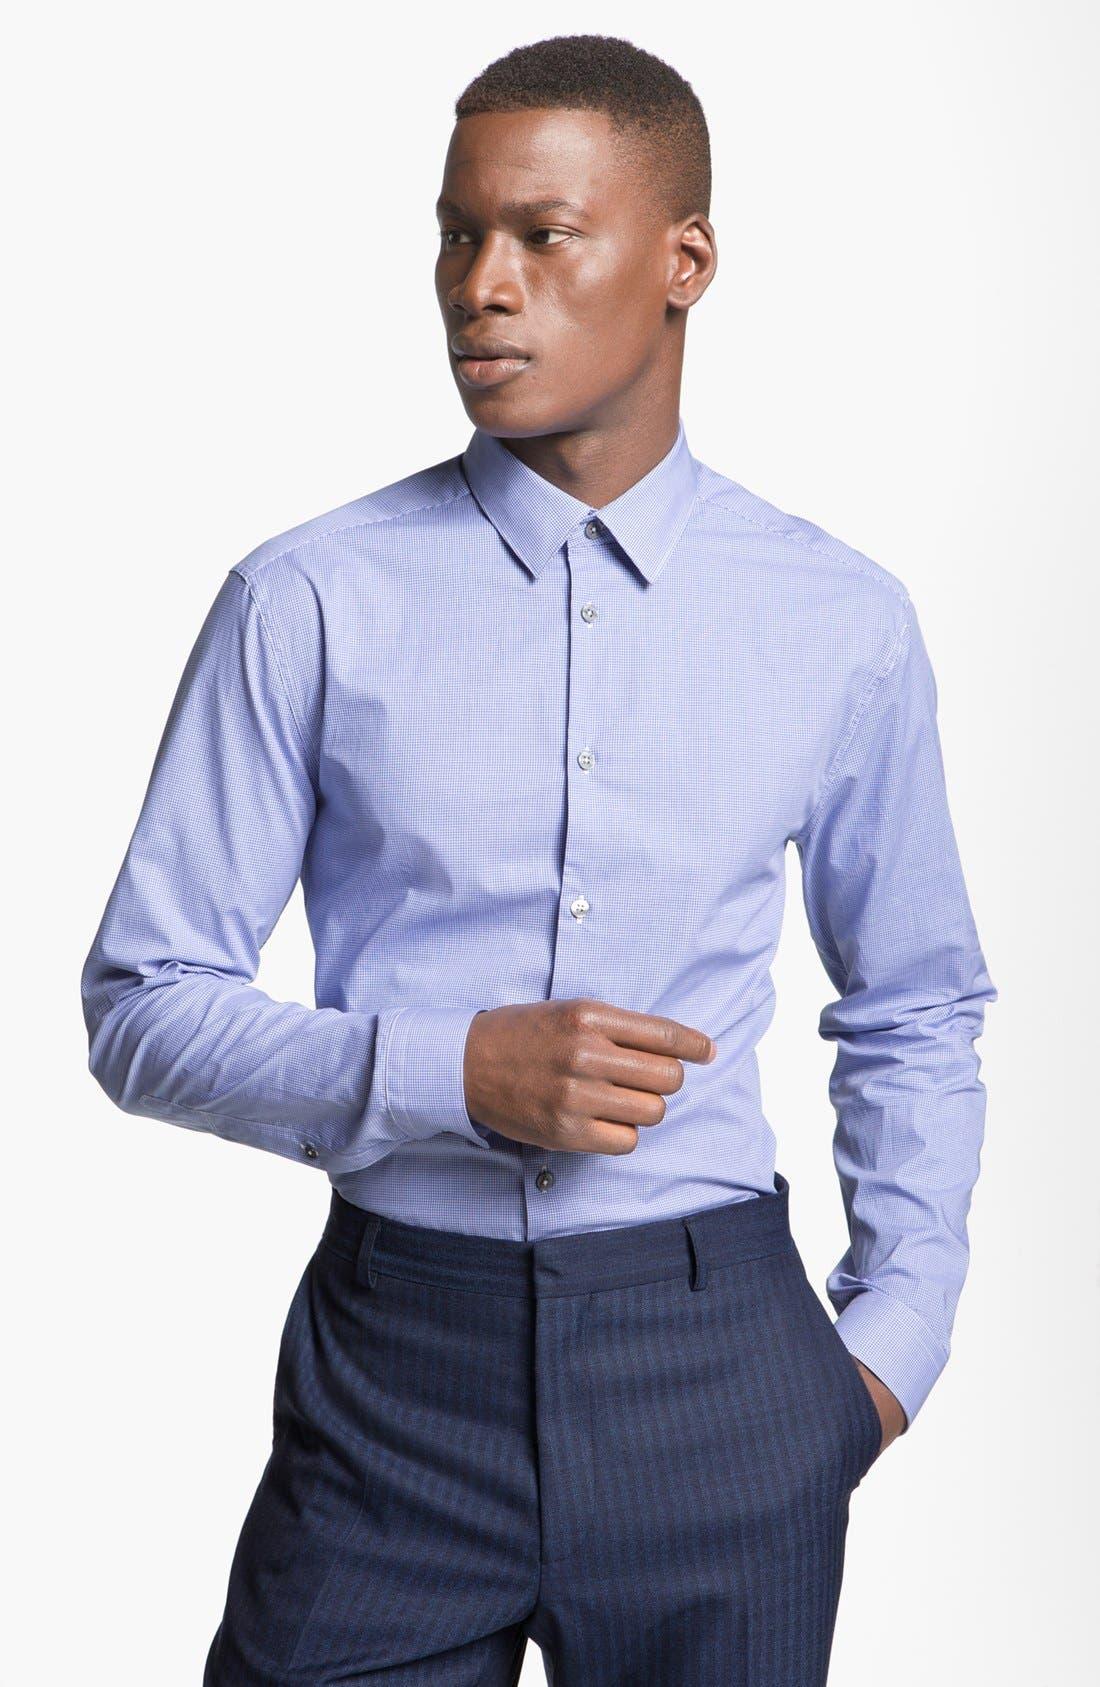 Main Image - Paul Smith London Slim Fit Microcheck Dress Shirt